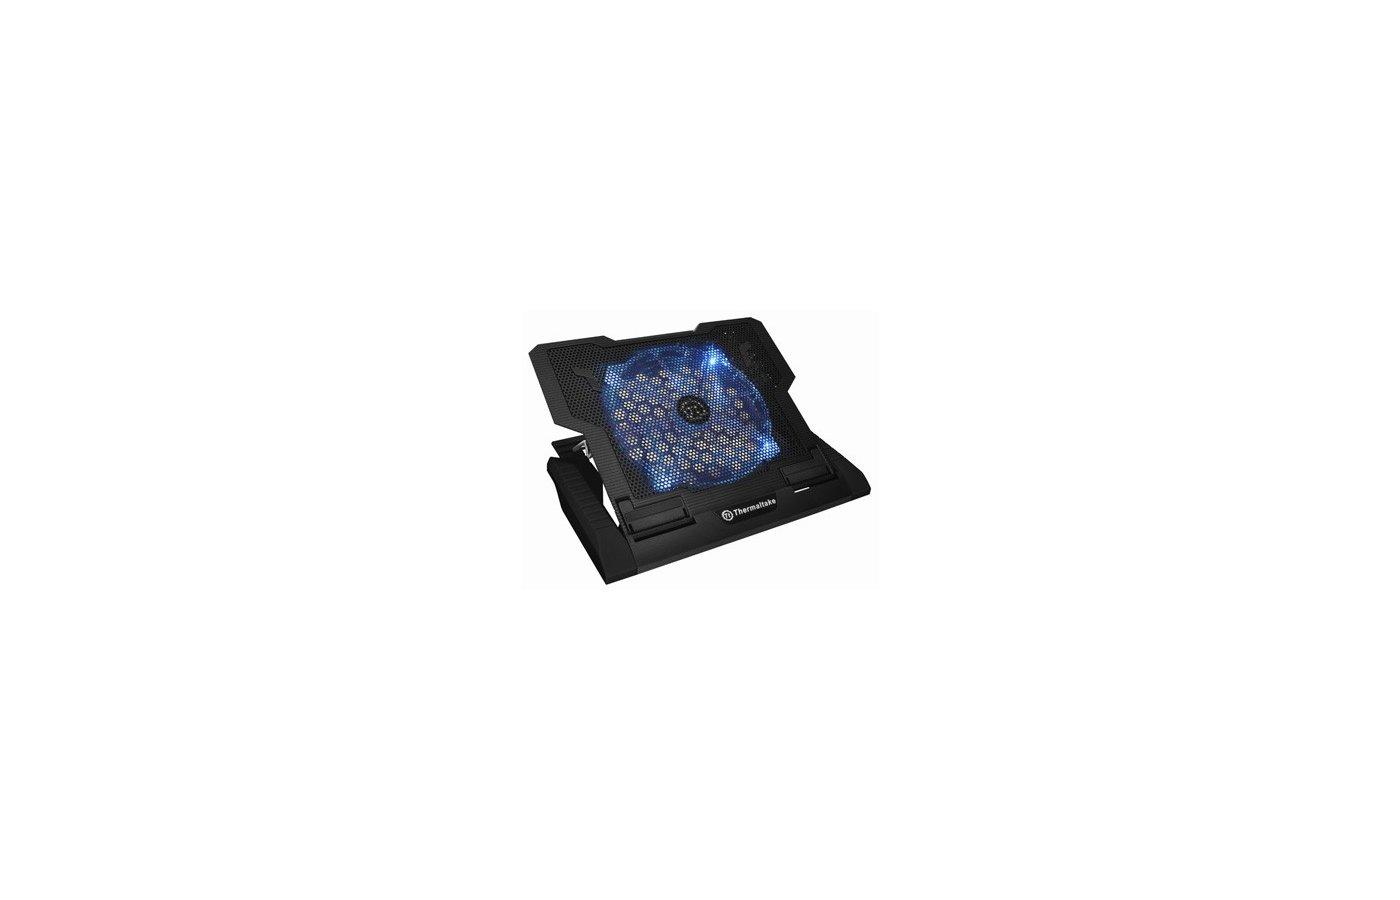 Подставка для ноутбука Thermaltake CLN0020 Massive 23 GT black